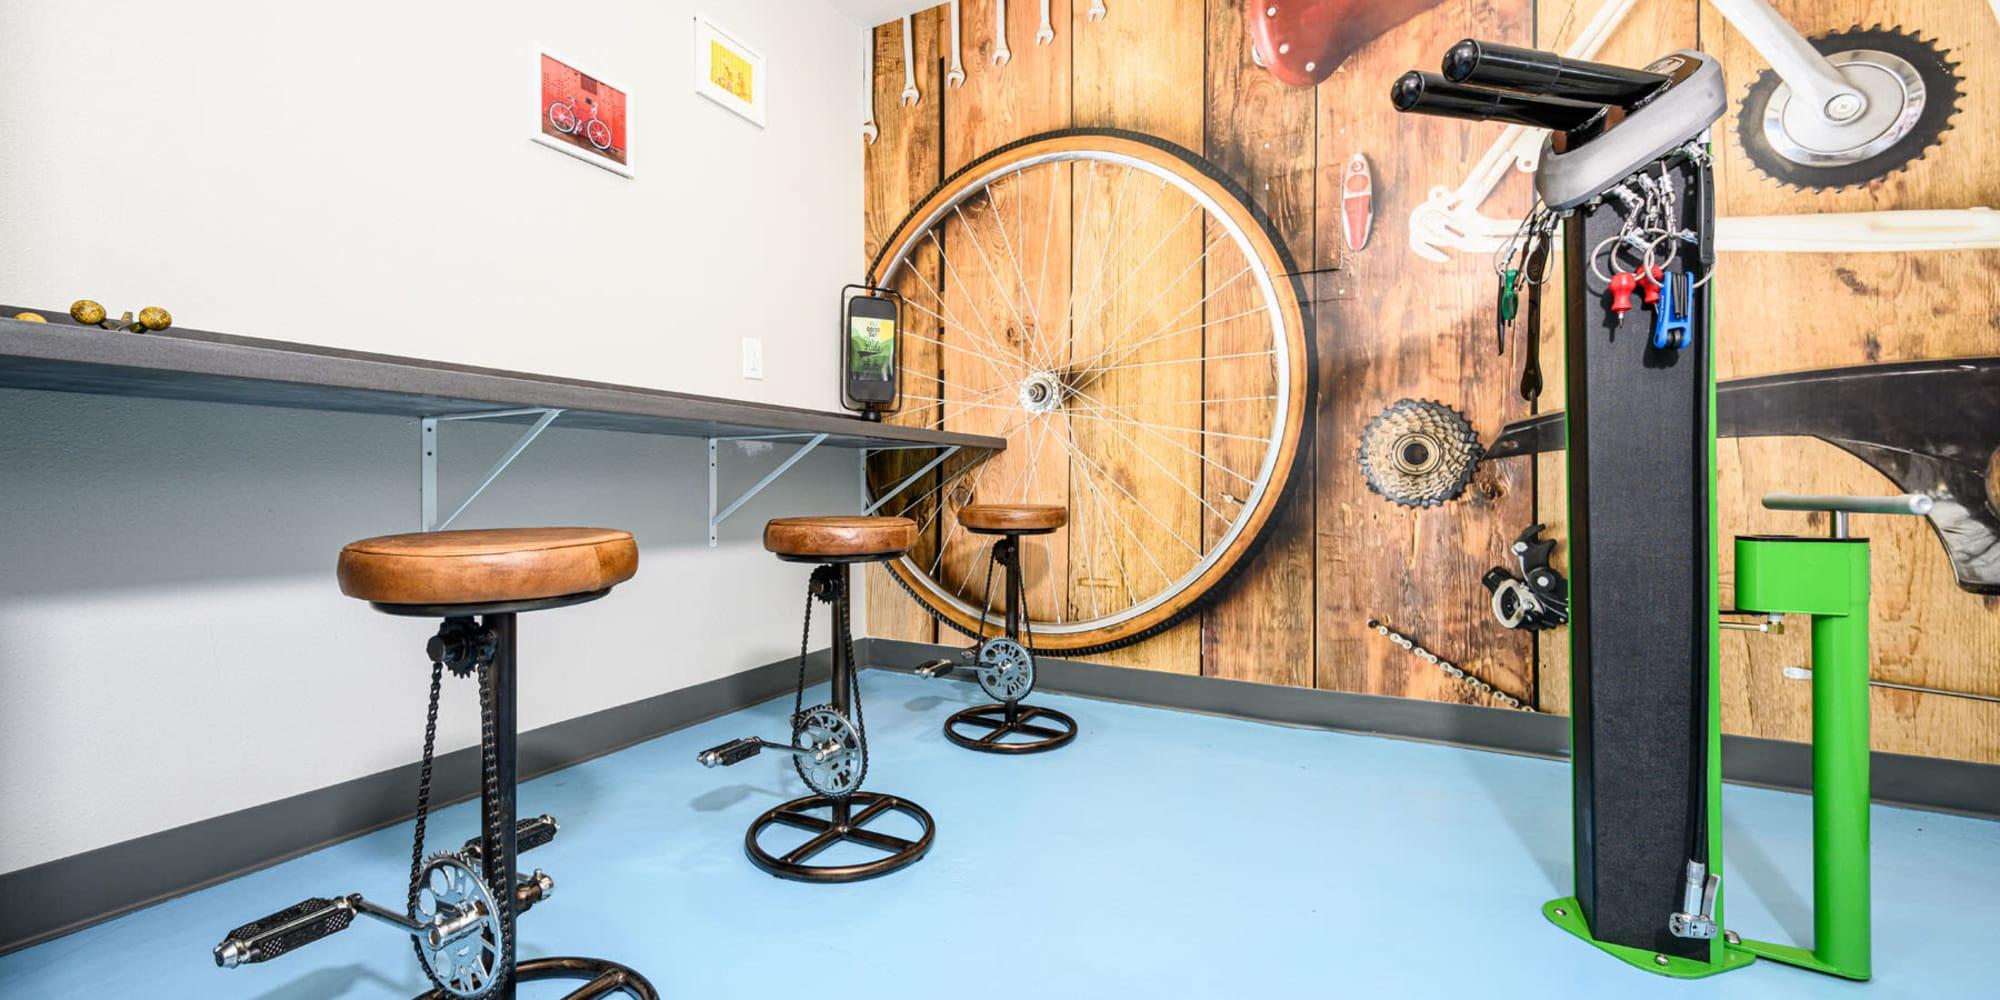 Bicycle repair station for resident convenience at Sendero Huntington Beach in Huntington Beach, California